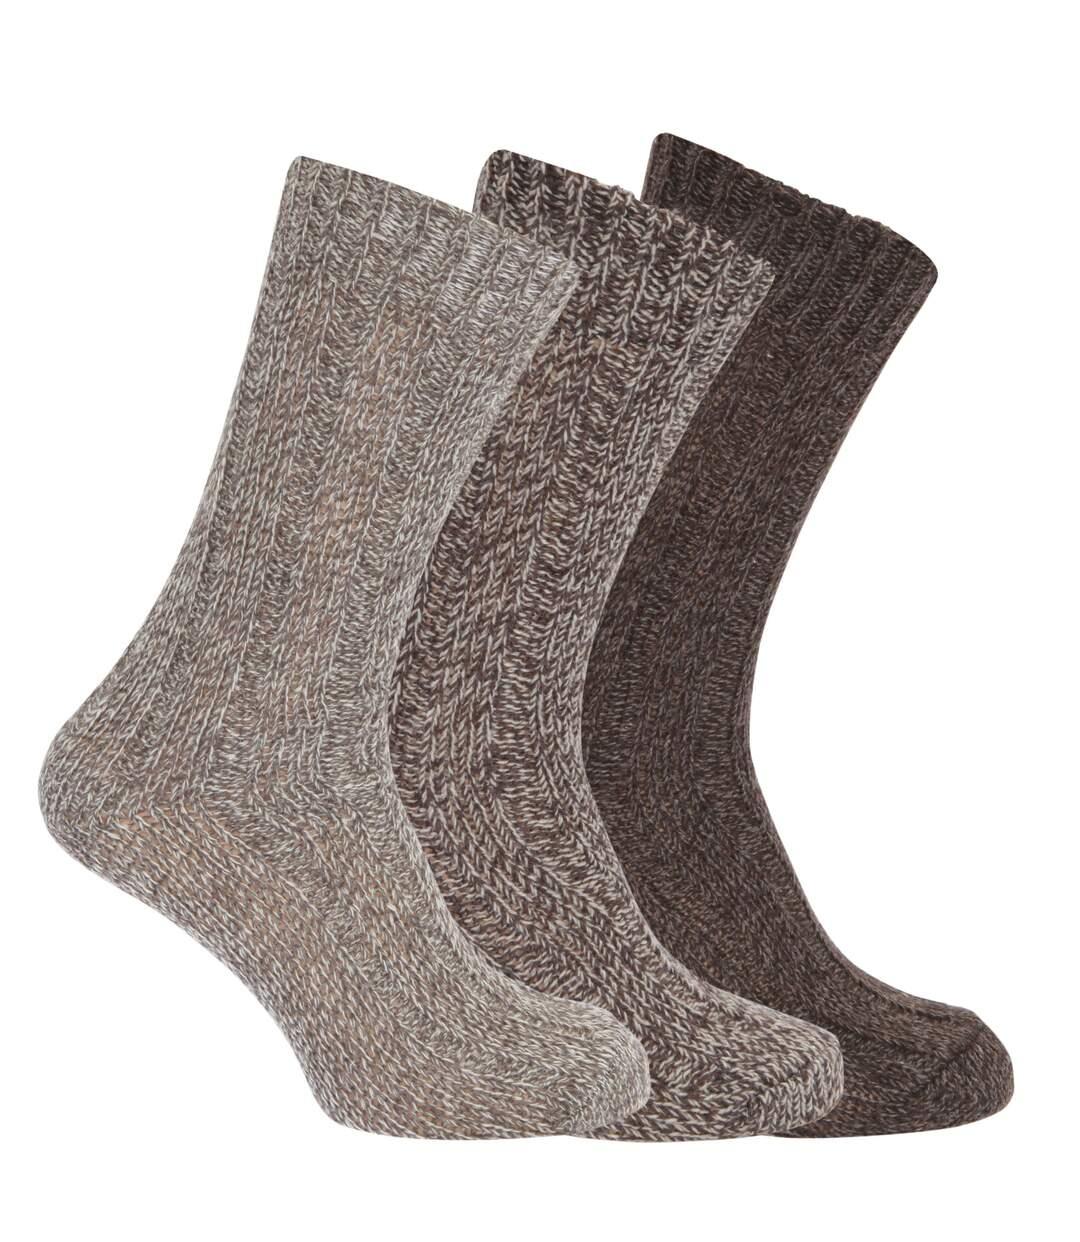 Mens Wool Blend Boot Socks (Pack Of 3) (Shades of Brown) - UTMB158